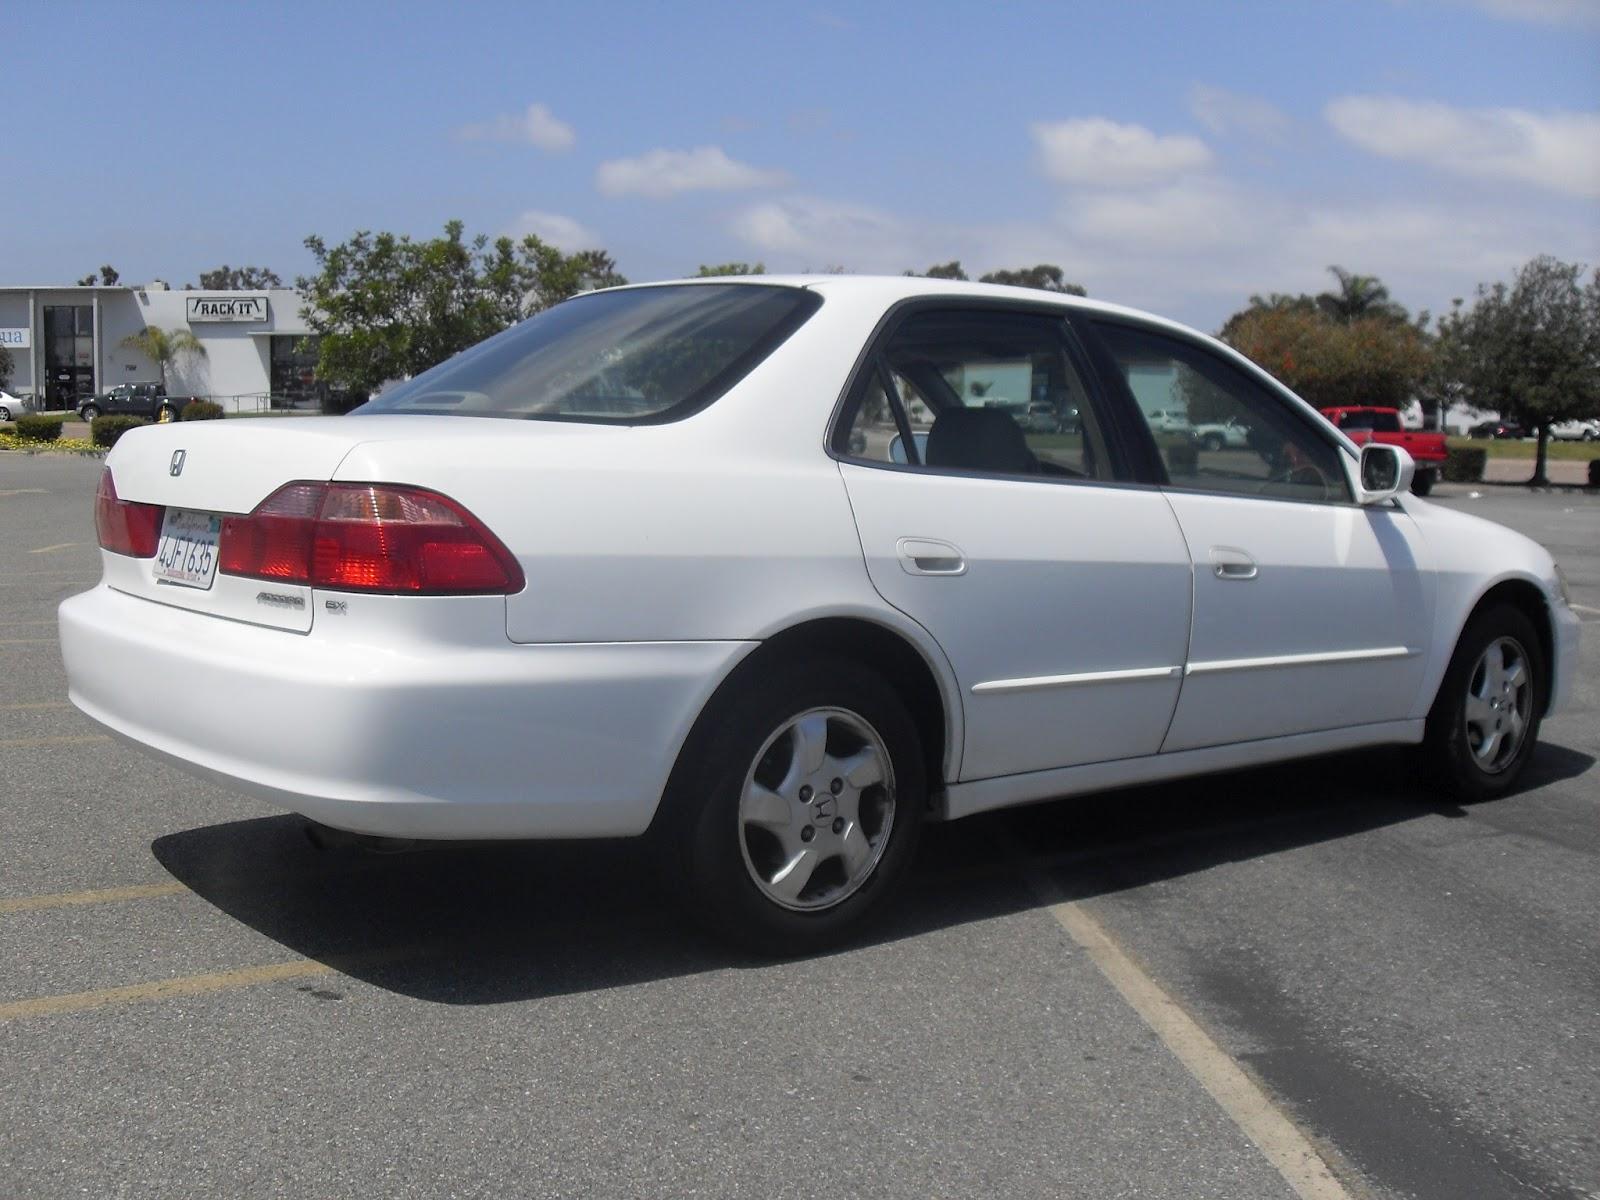 2000 Honda Accord #9 Honda Accord #9